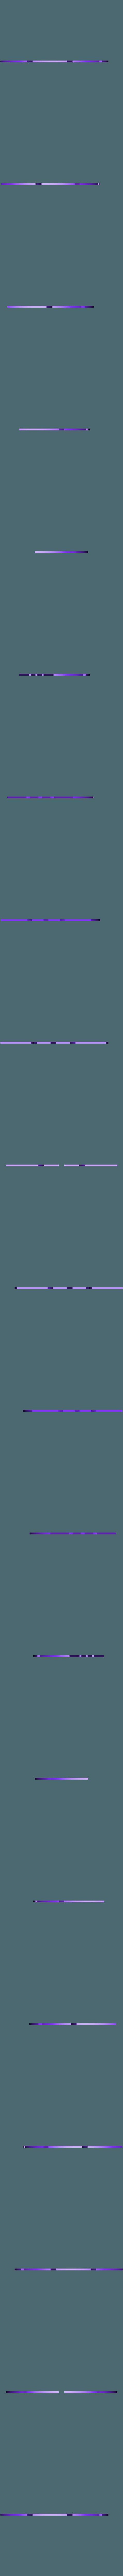 Kings_black_purple.STL Download free STL file Minimal Multi-color NBA coasters • 3D print object, MosaicManufacturing